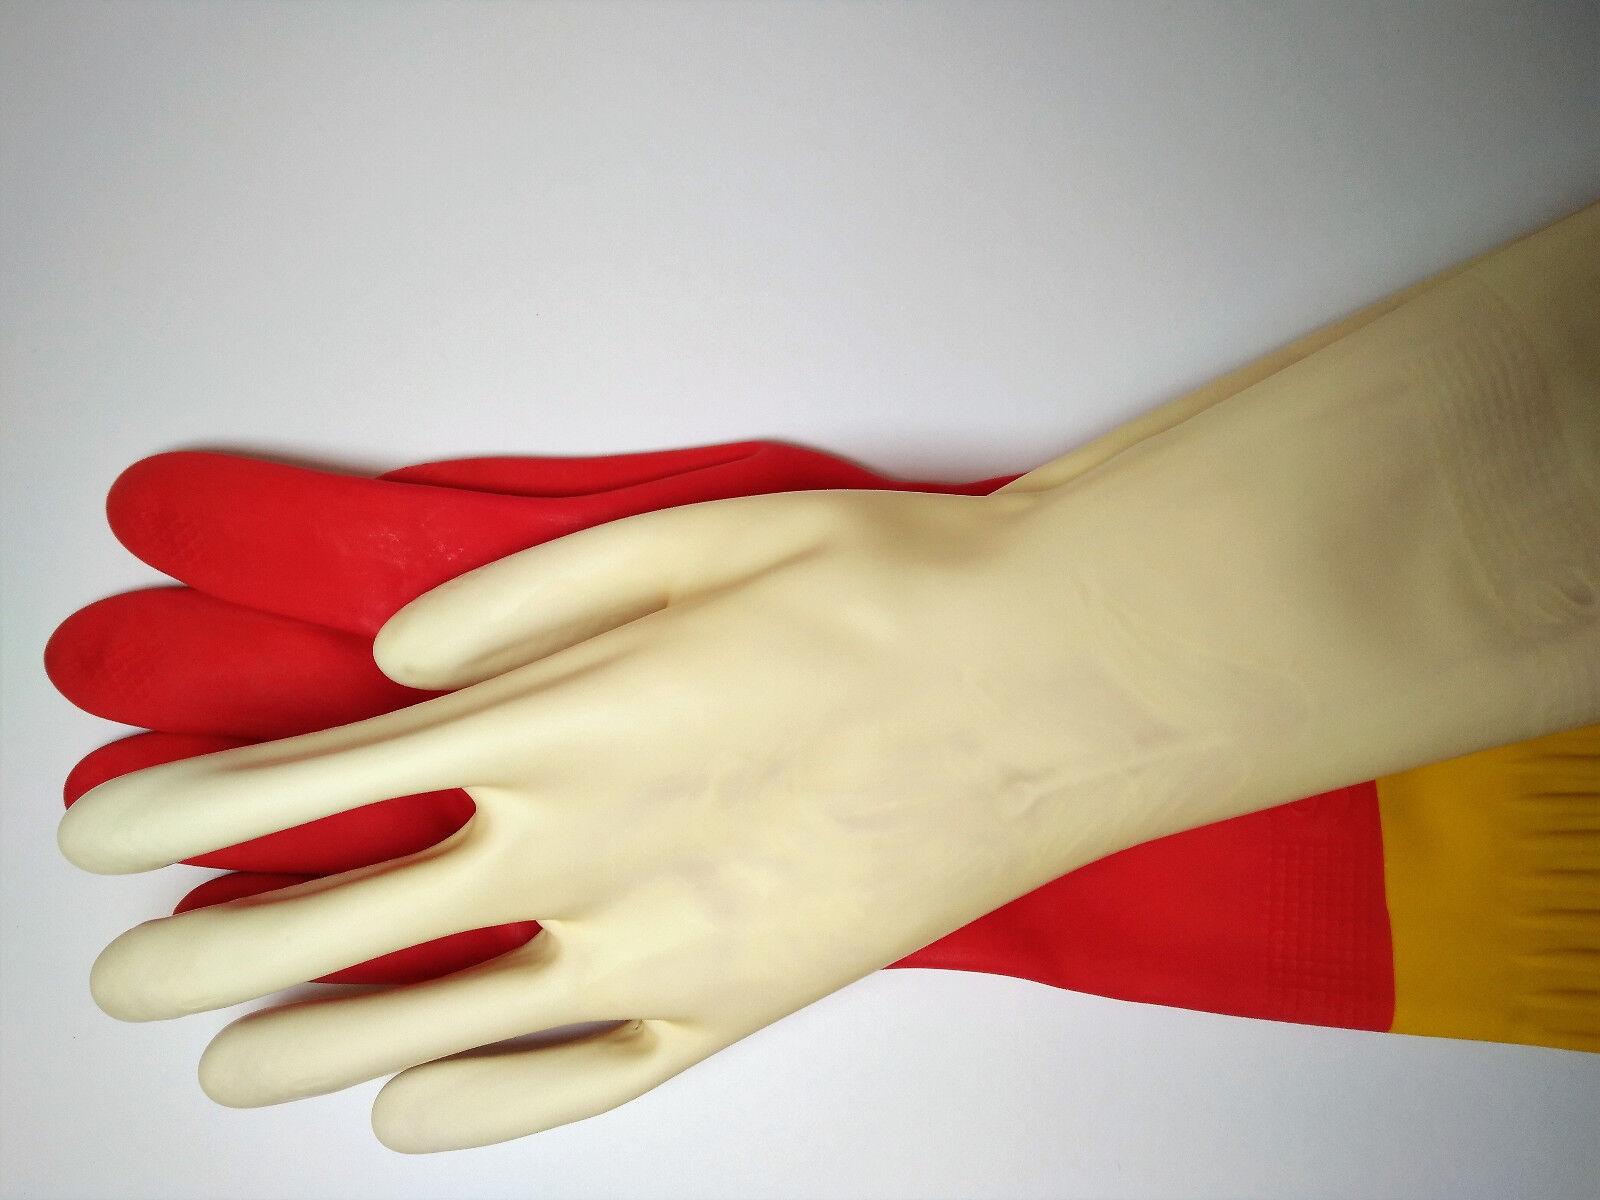 Haushaltshandschuhe 45cm lang Gummihandschuhe extra lang long rubber gloves #04